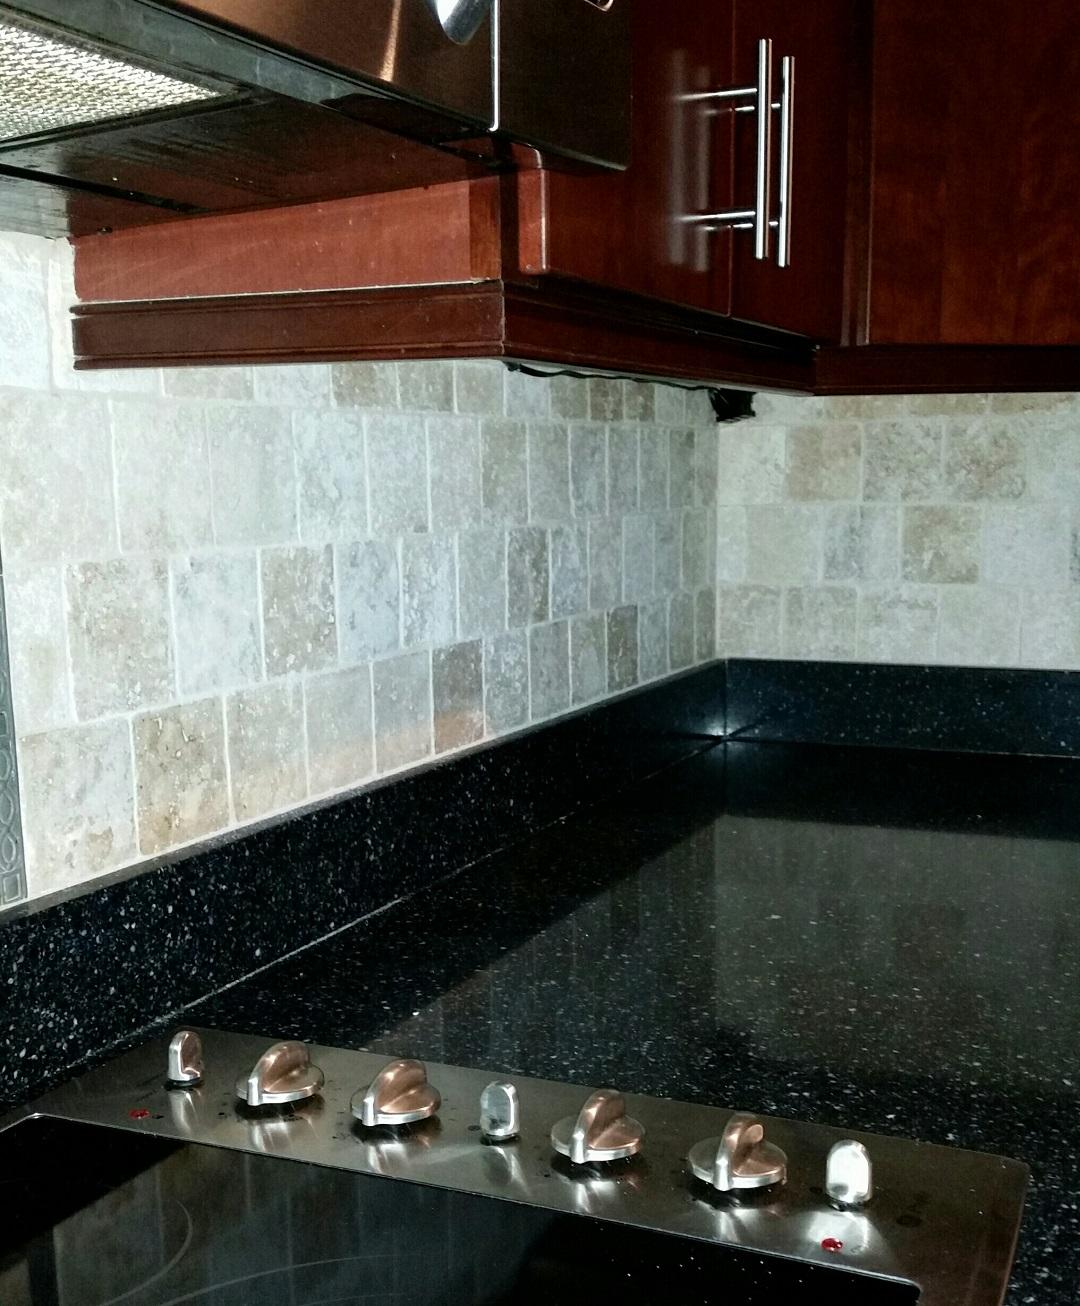 Funky Lins Kitchen Grain Valley Mo Frieze - Modern Kitchen Set ...